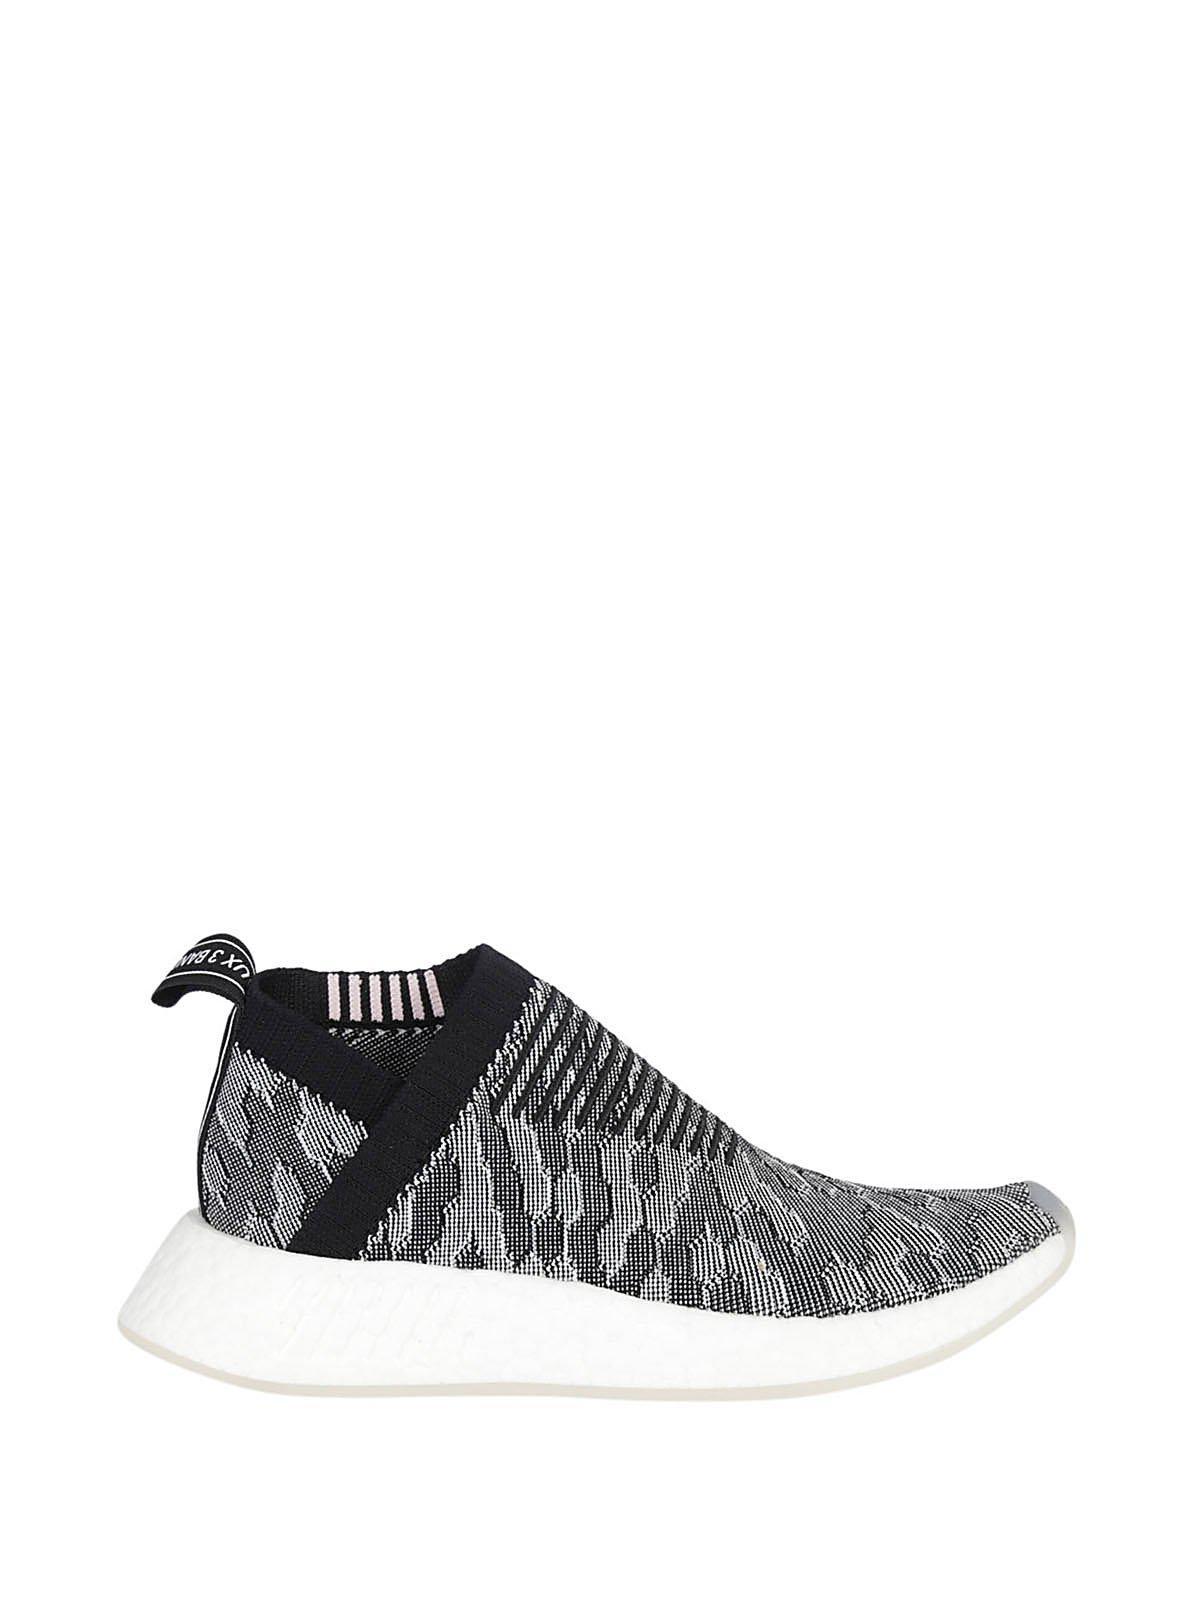 057fbc59e7b9a Lyst - adidas Originals Nmd Cs2 Primeknit Sneakers in Black